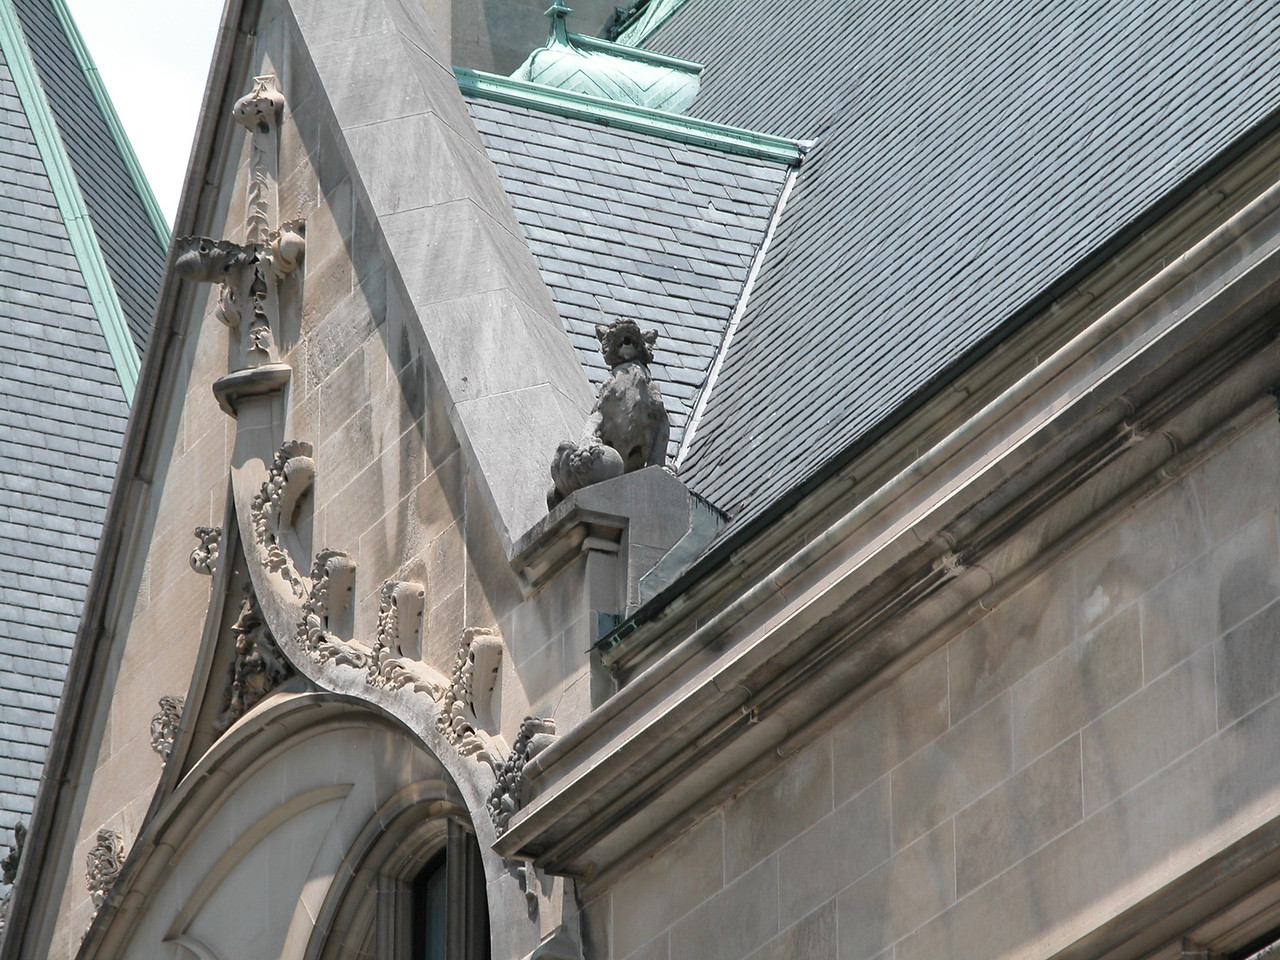 Gargoyles watch over the house.